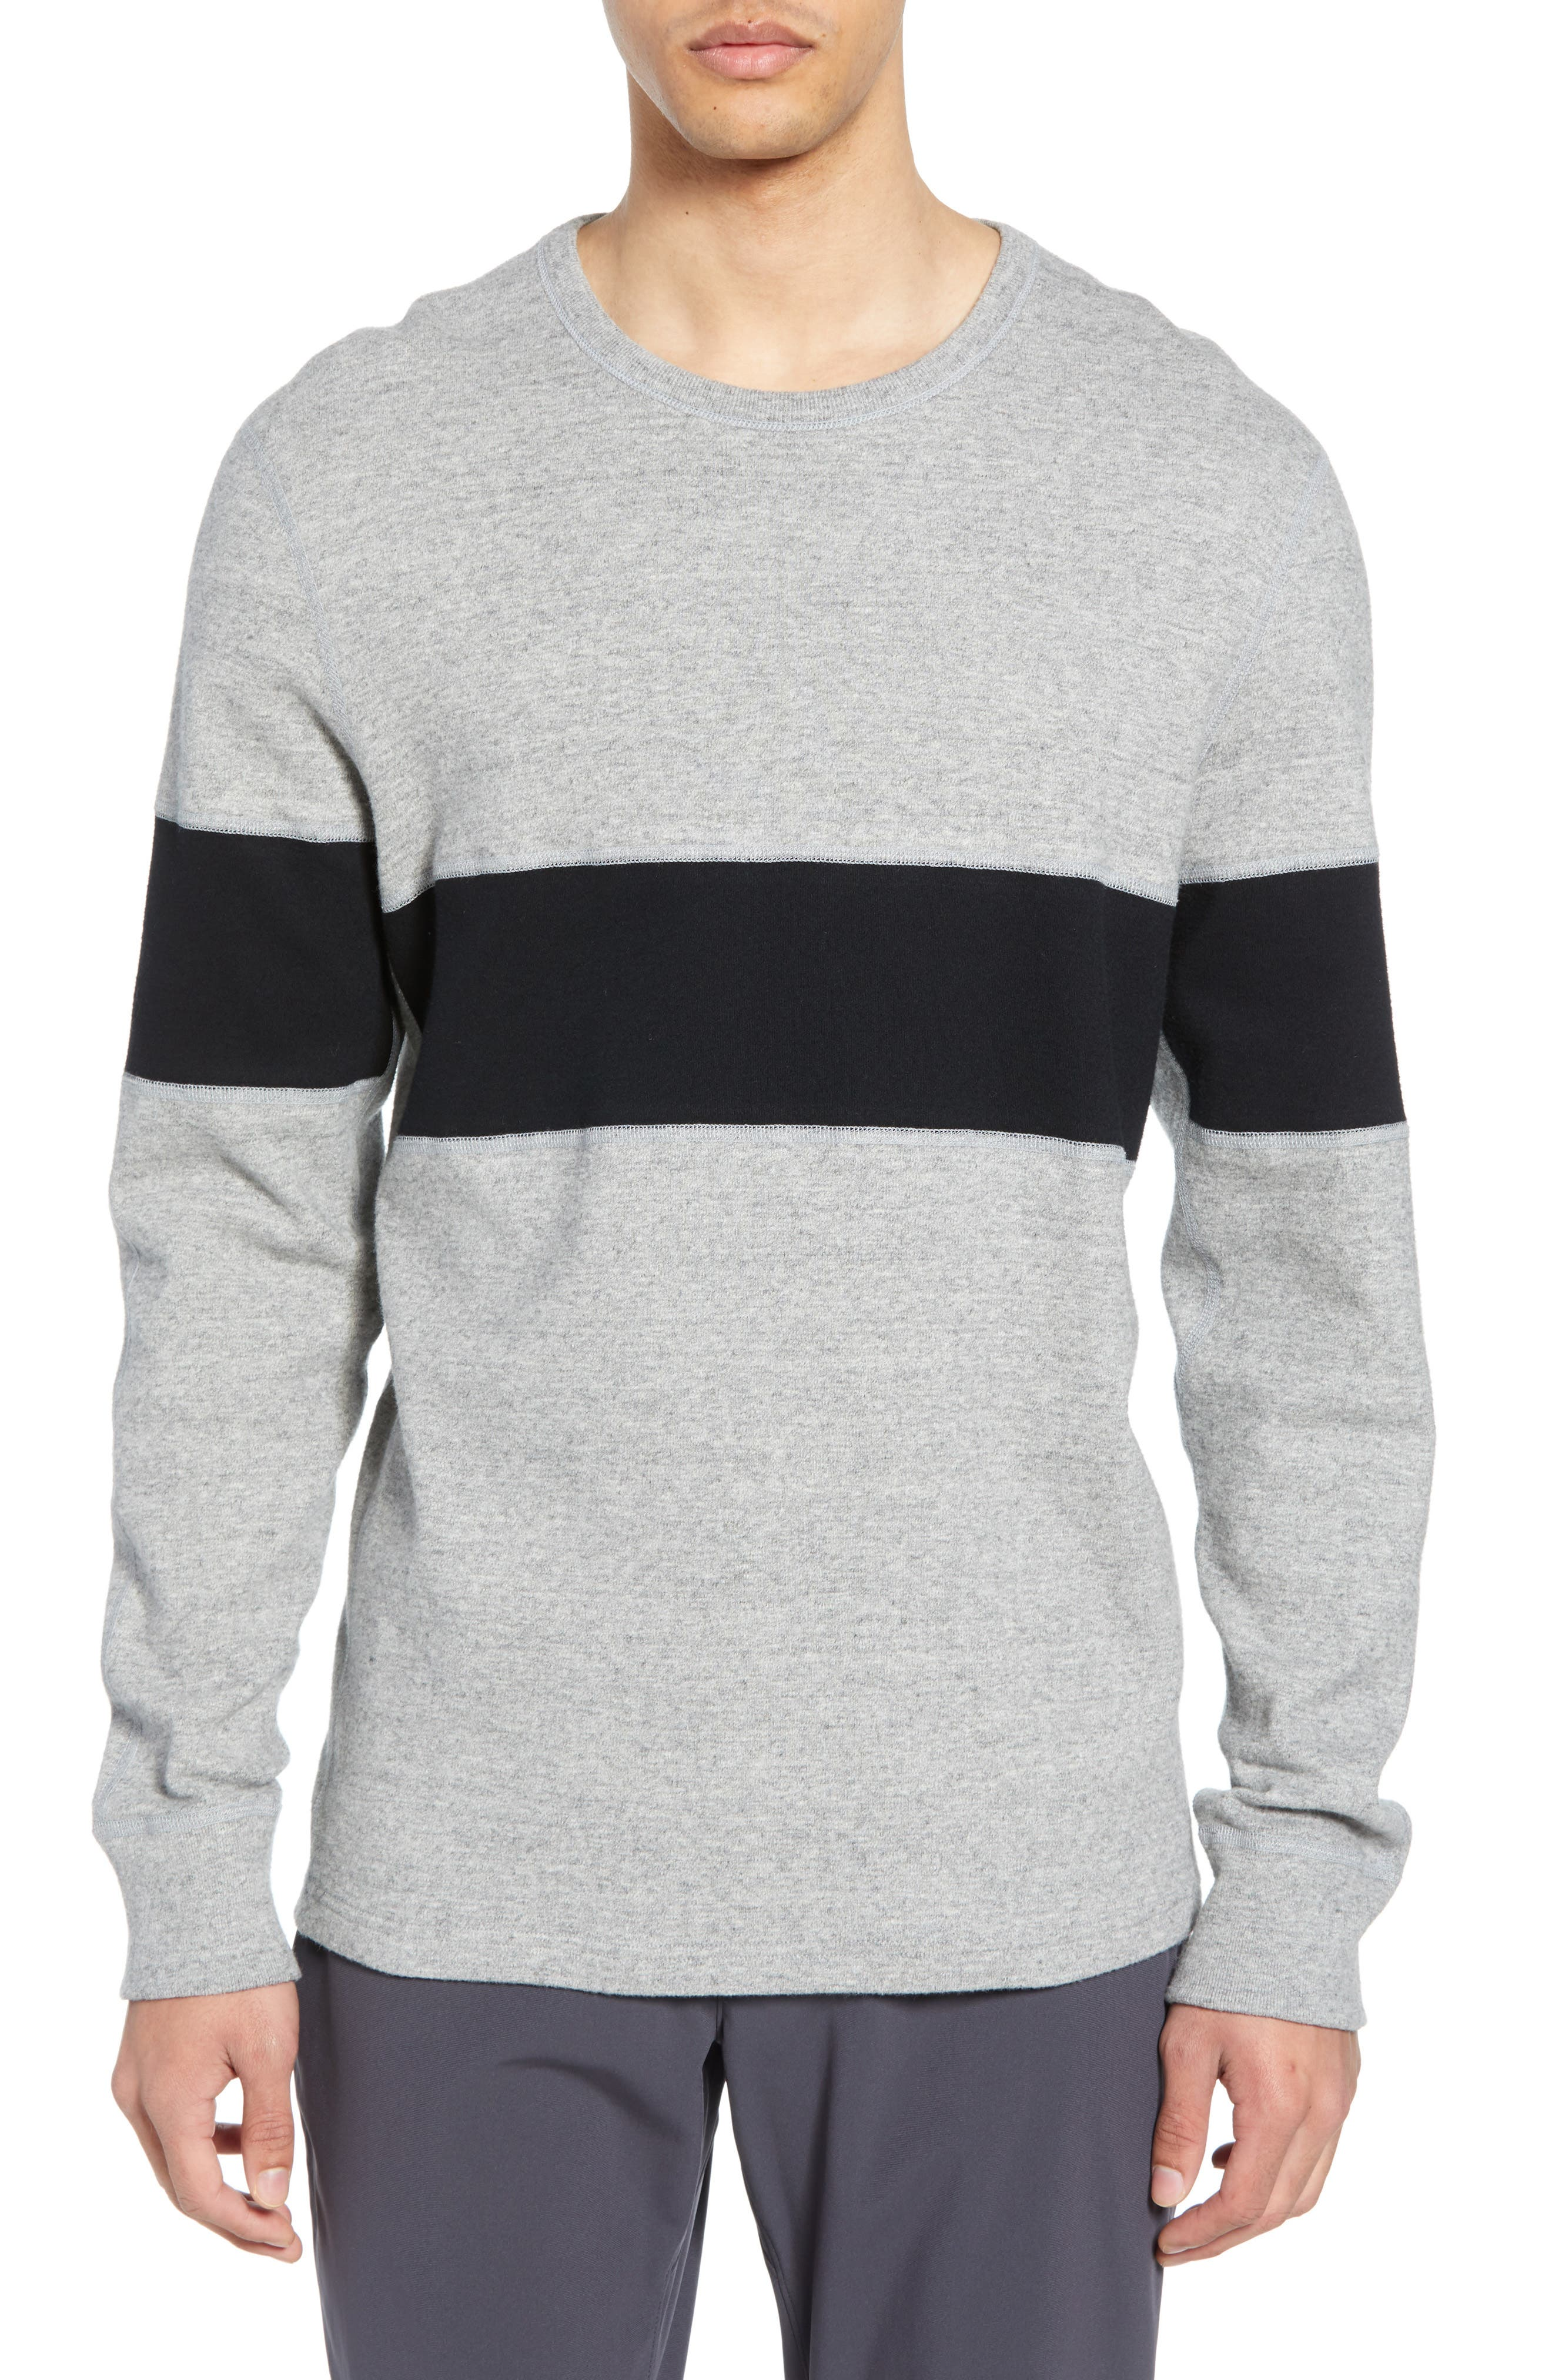 REIGNING CHAMP Rugby Crewneck Sweatshirt, Main, color, MEDIUM GREY/ BLACK